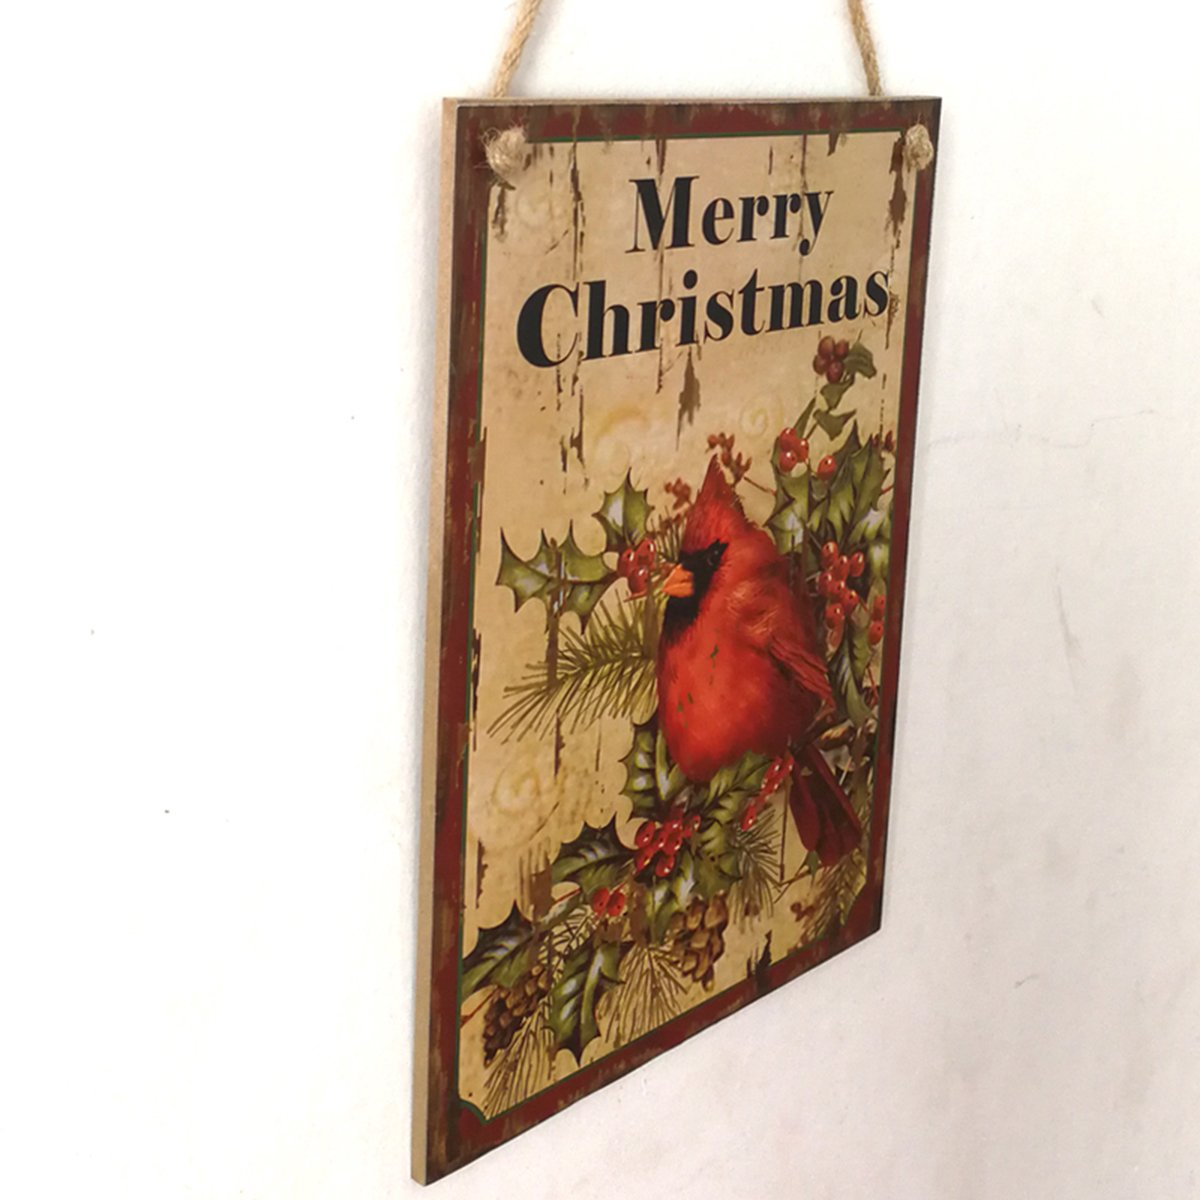 Addobbi Natalizi Vintage.Oulii Decorazioni Natalizie In Legno Addobbi Natalizi Porta Merry Christmas Targhe Decorative Vintage